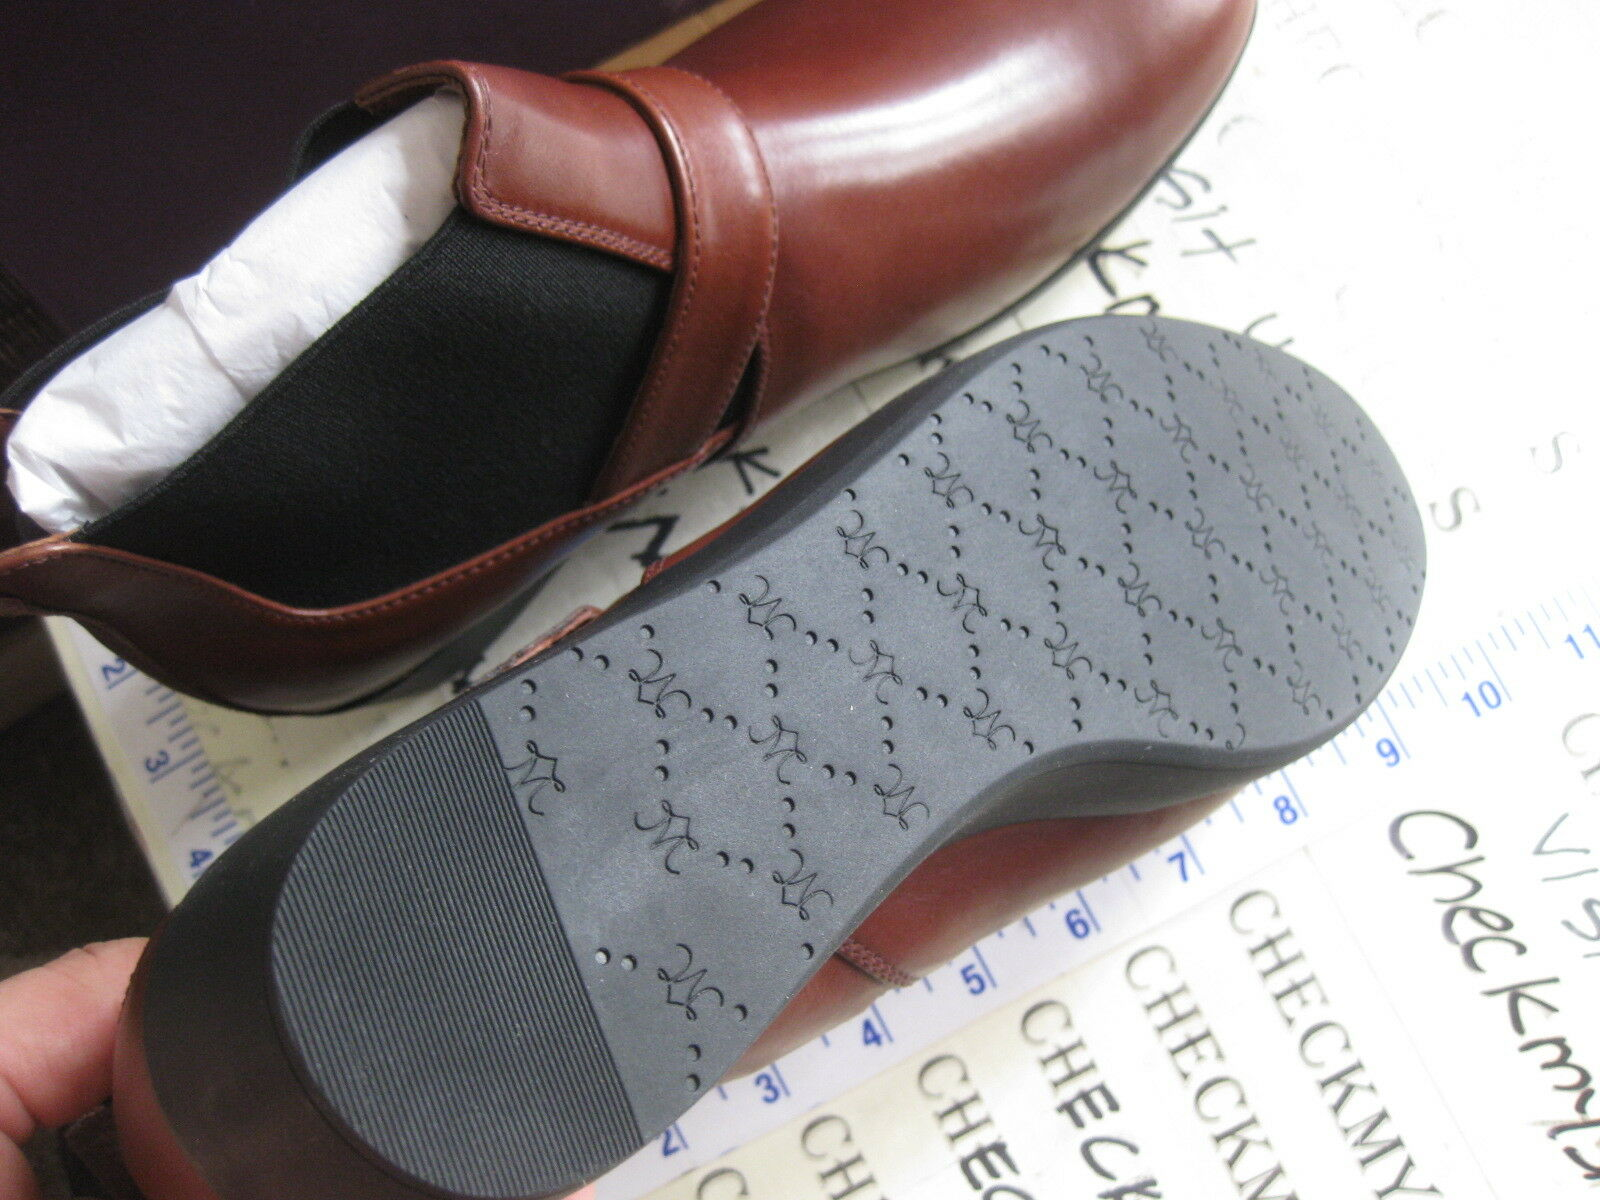 Johnston & Murphy Danielle 78-56107 78-56107 78-56107 Premium Waterproof leather bottes choose Taille c5c22c